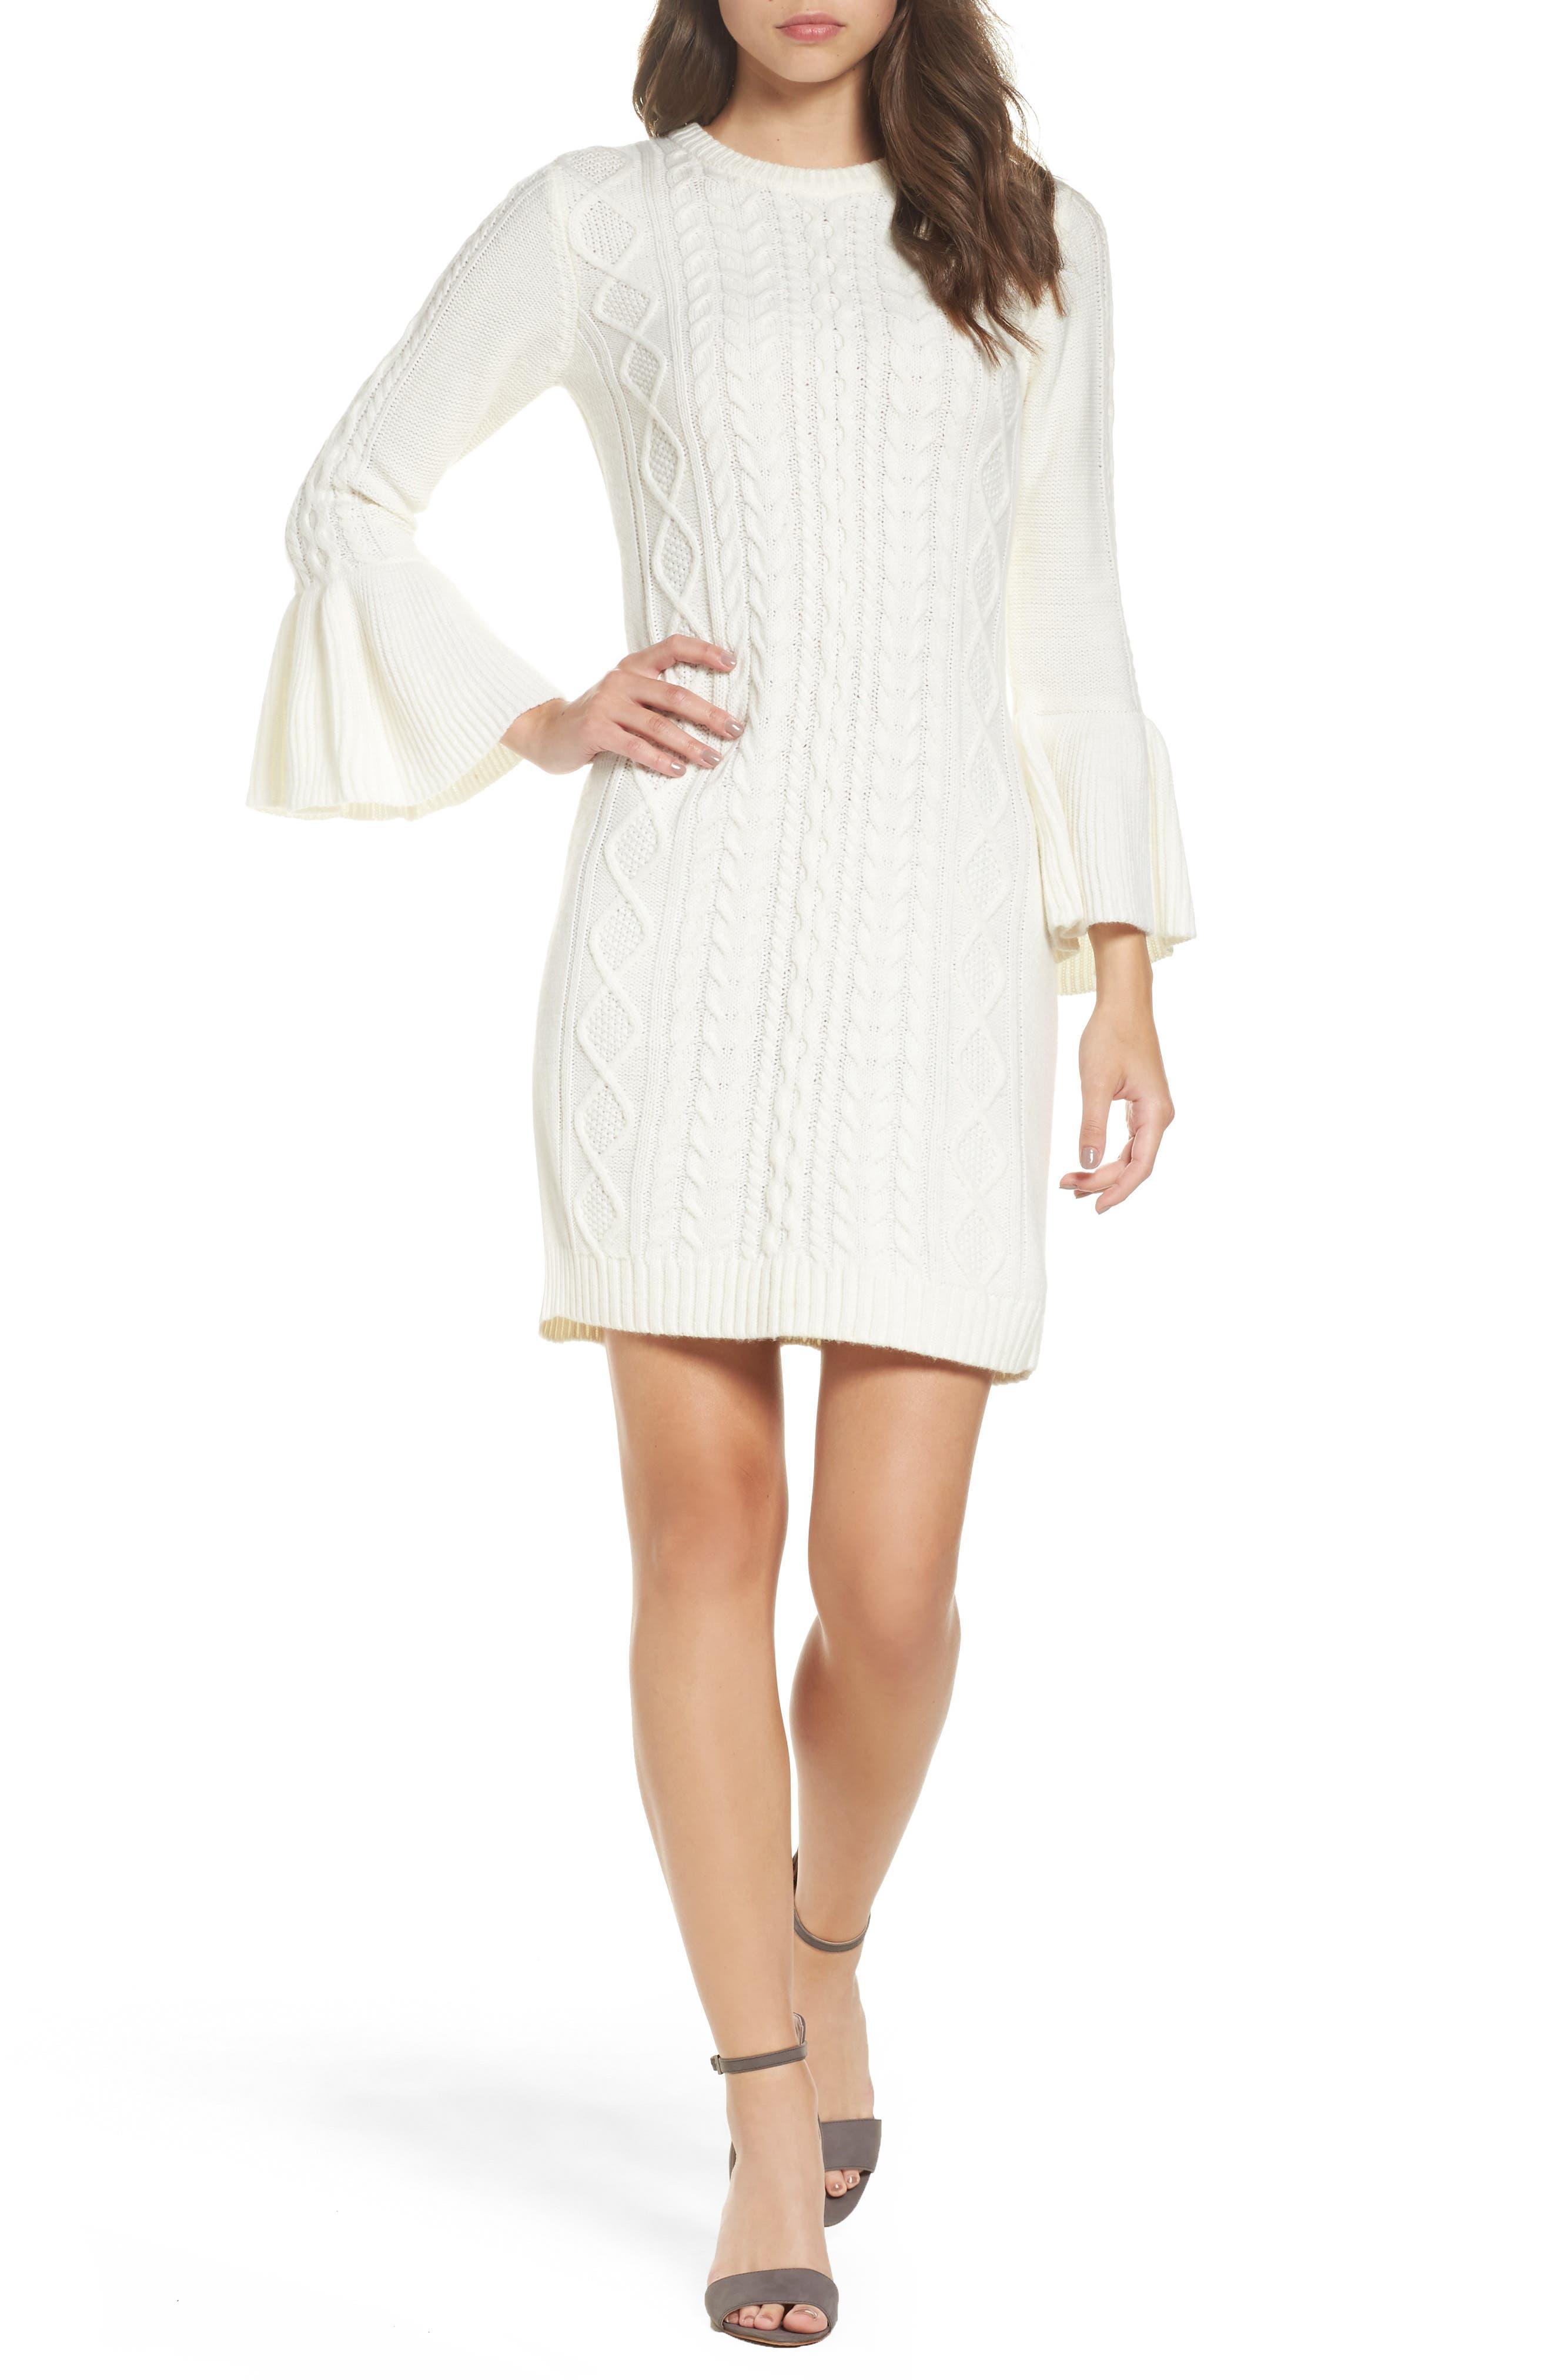 Cotton dresses for summer wedding nordstrom